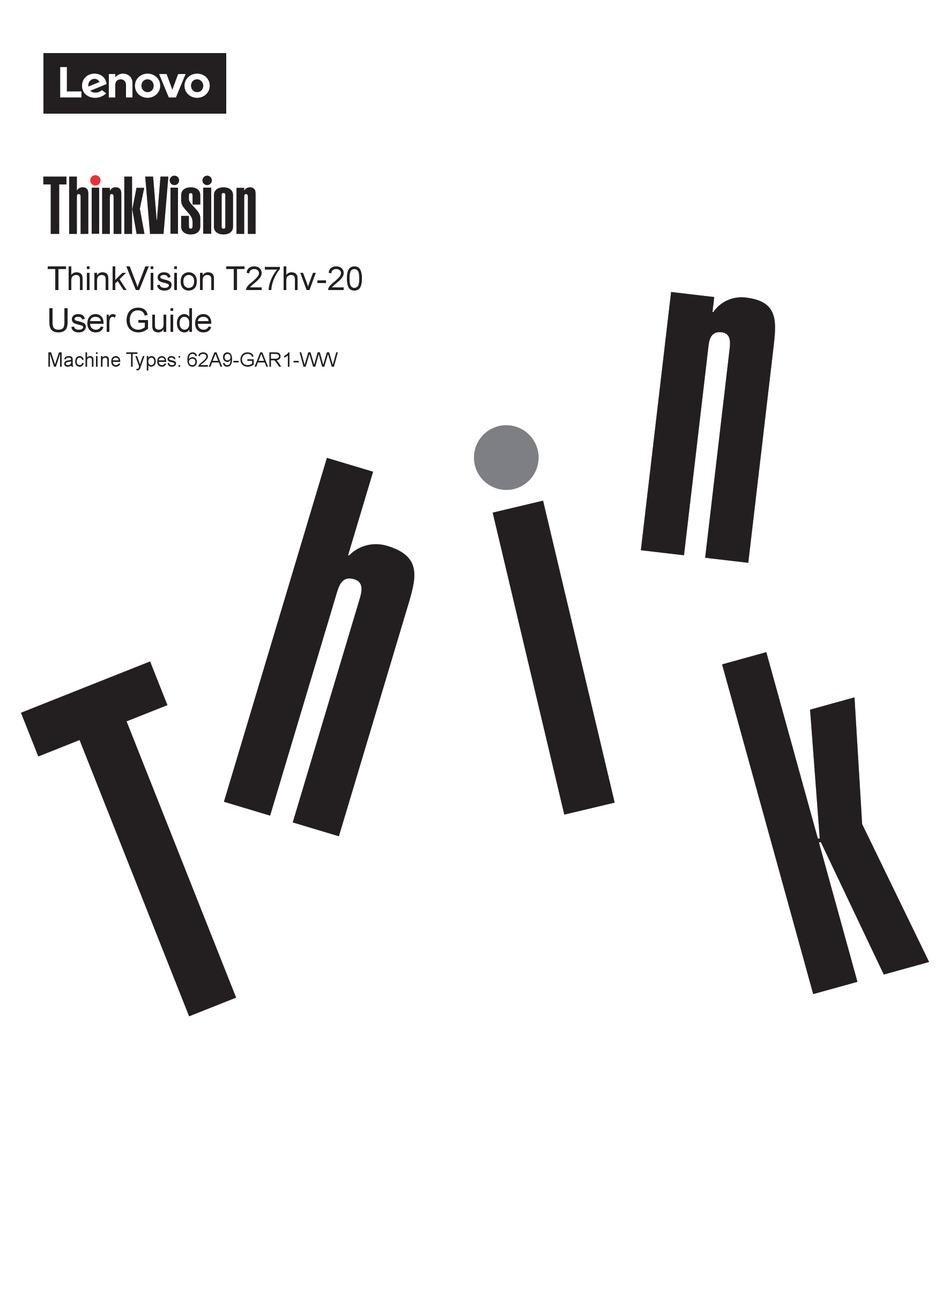 LENOVO THINKVISION T27HV-20 USER MANUAL Pdf Download